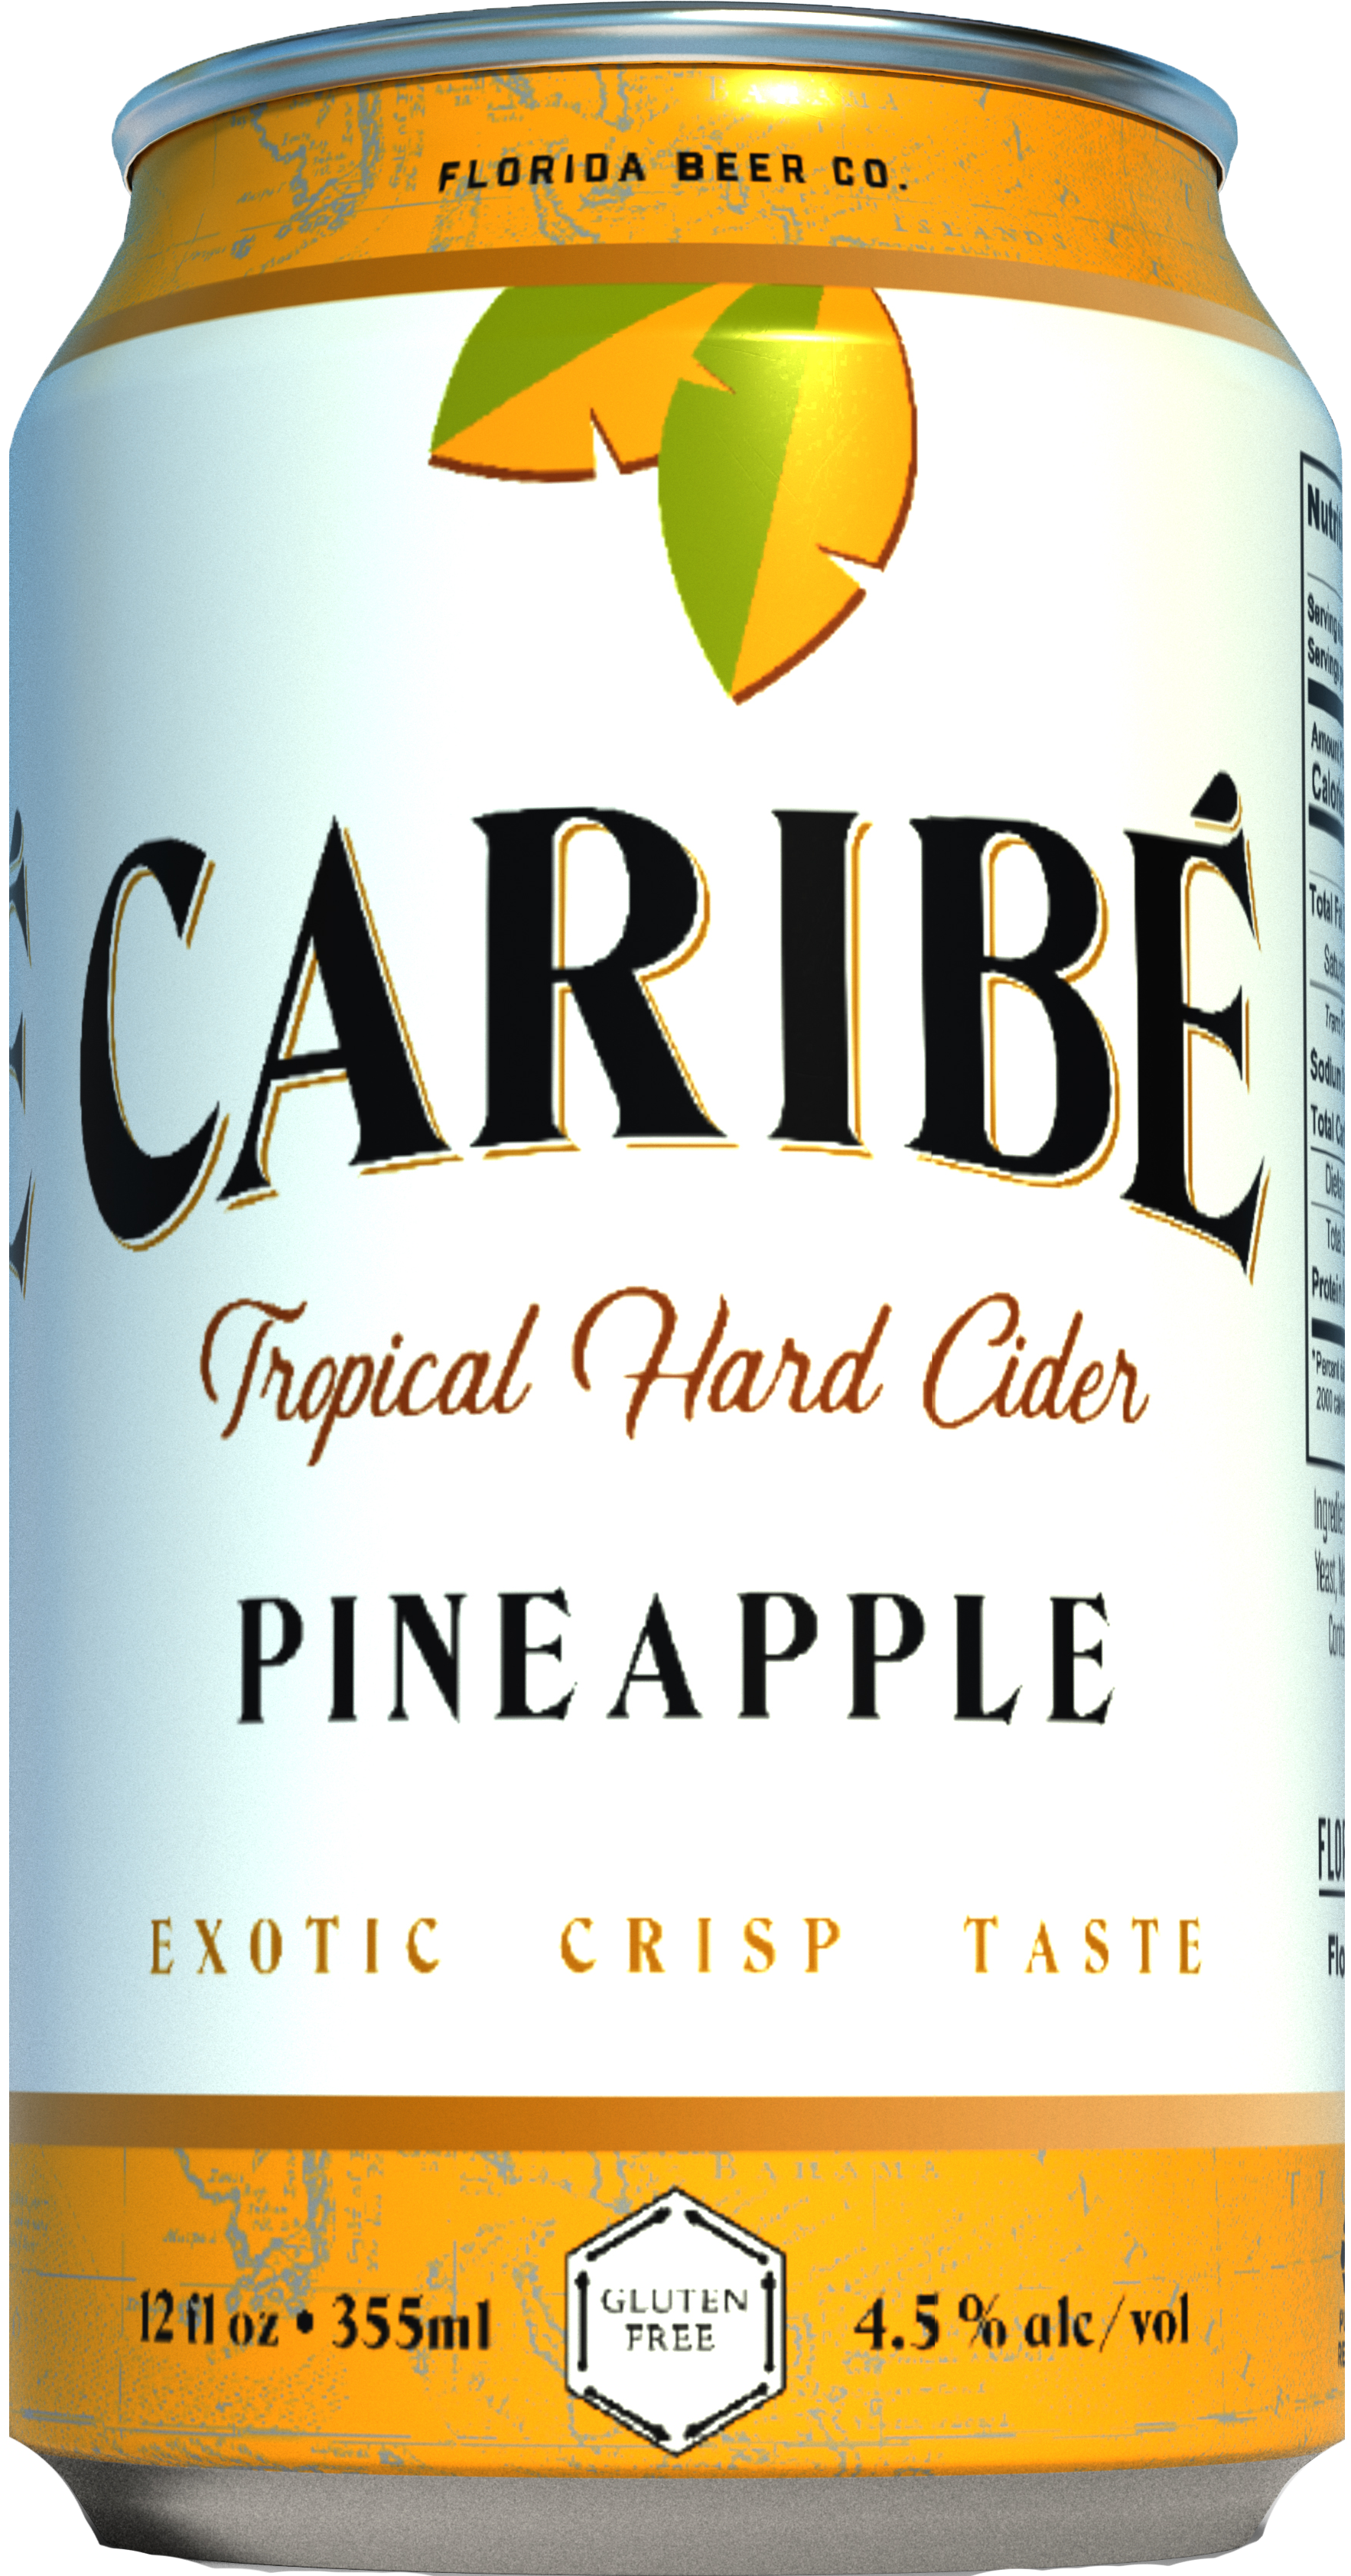 Caribe Pineapple Cider